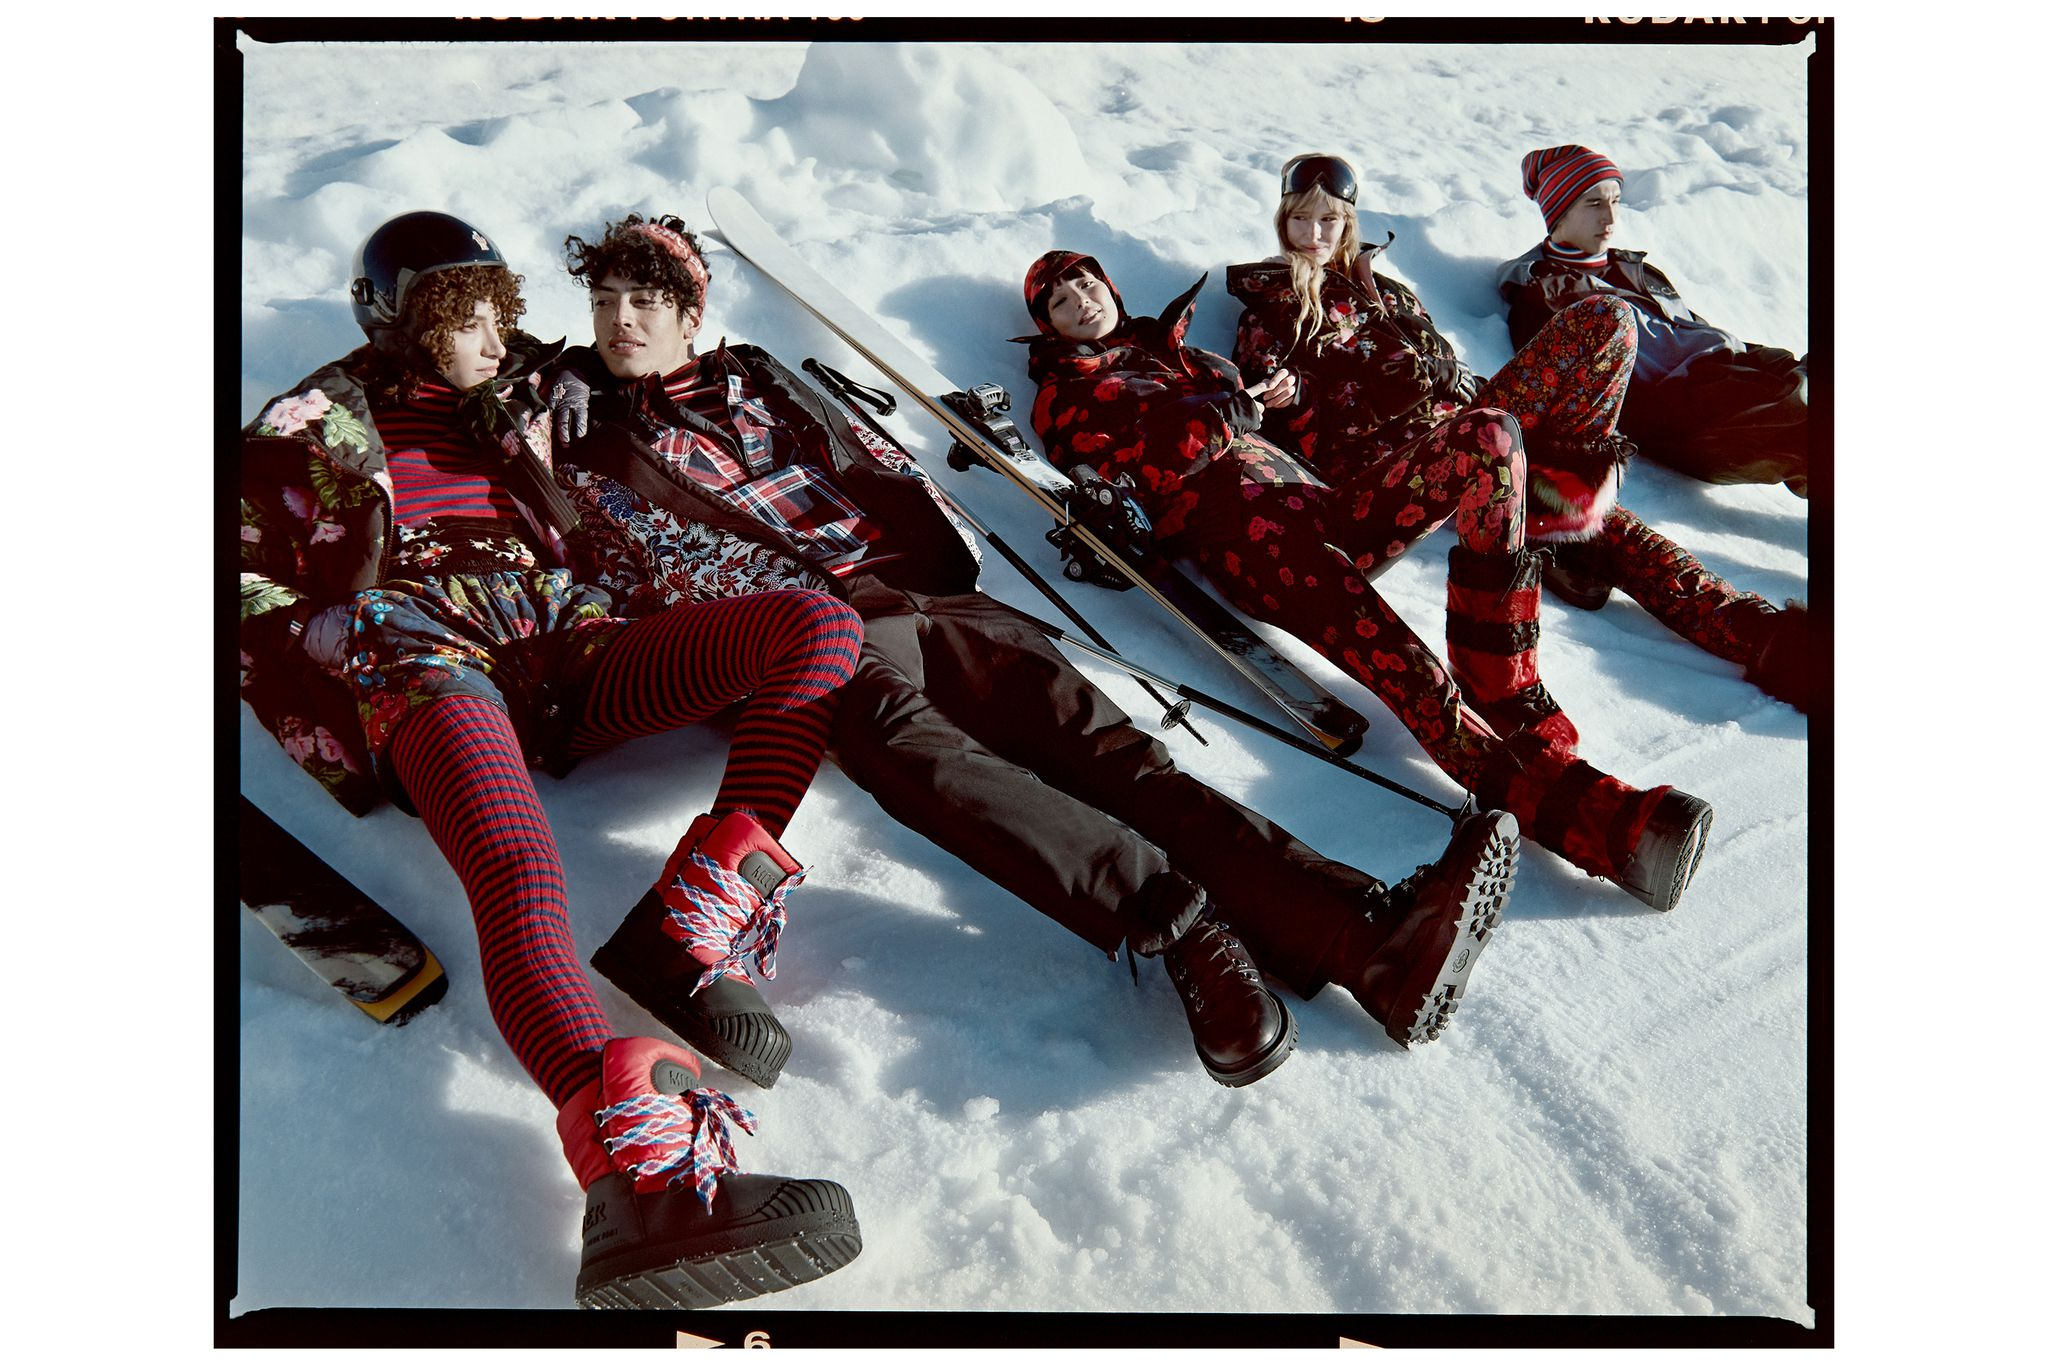 На мужчинах: куртка Born, горнолыжные штаны, водолазка, комбинезон, шапка изтрикотажа, все Moncler Grenoble